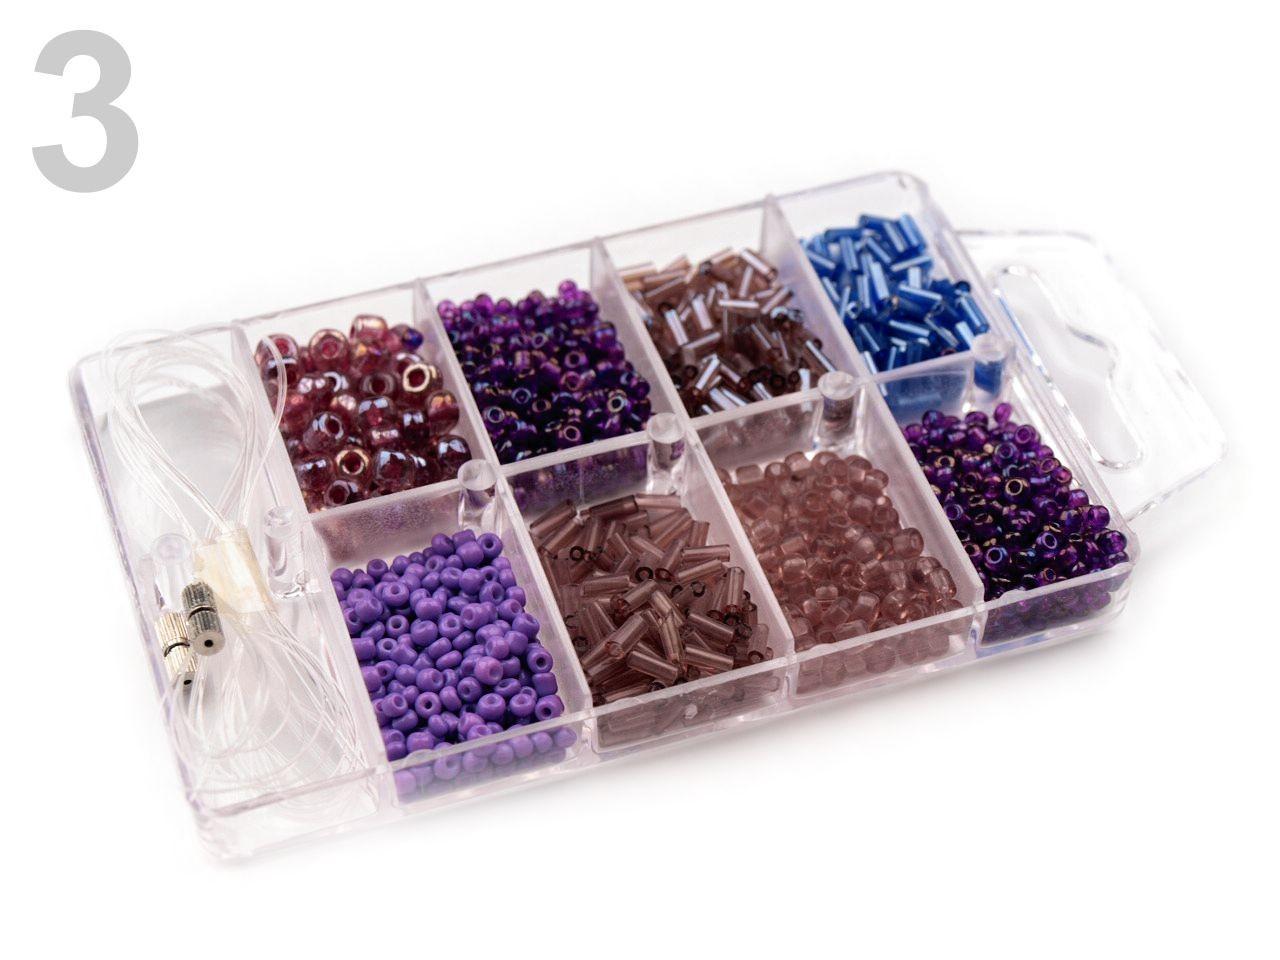 Korálky ROKAJL v plastovém boxu 210878 1krab, - 53 Kč / krab, 3 Dusty Lavender